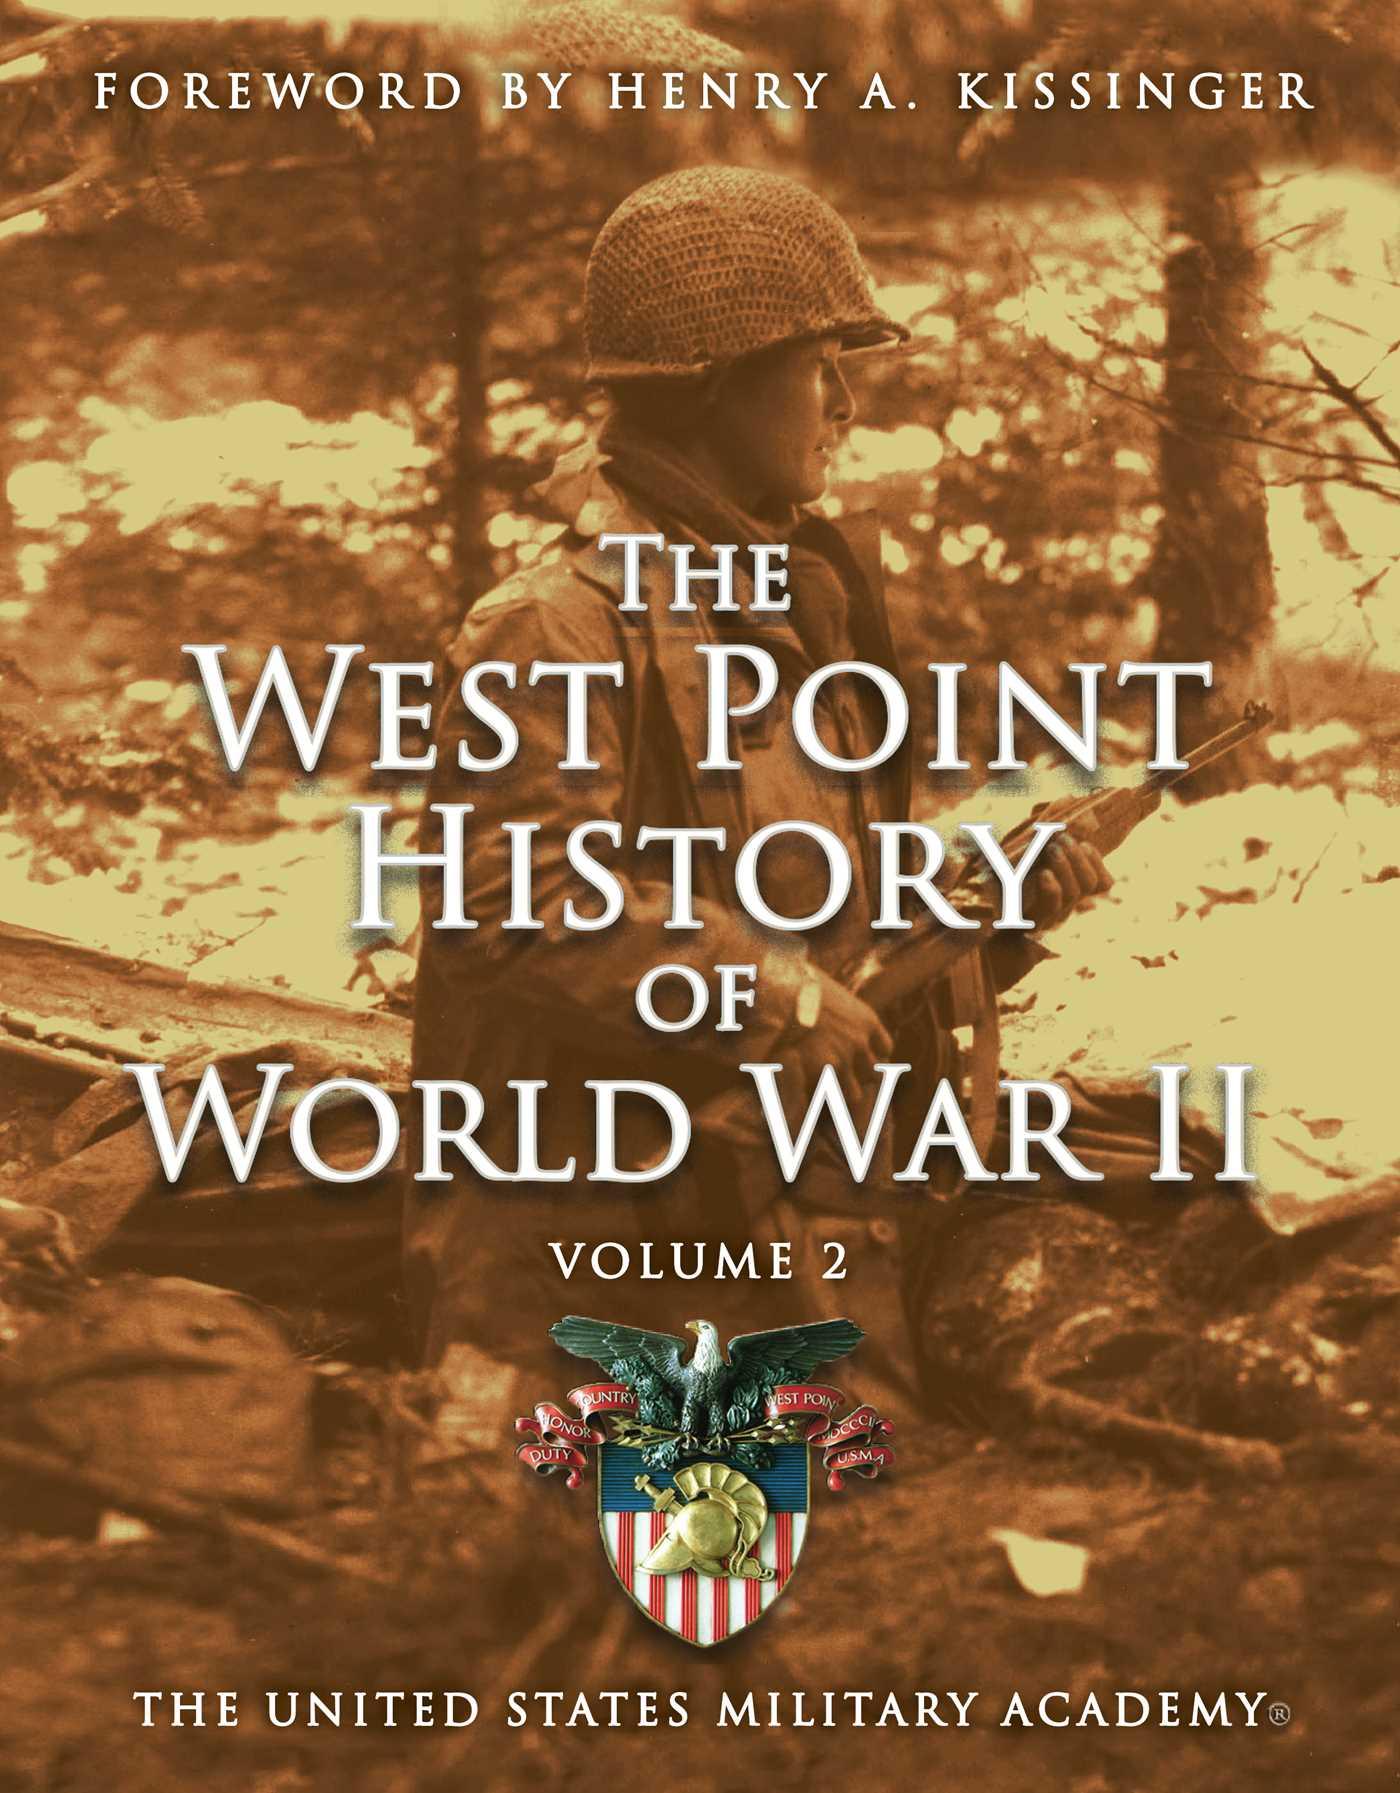 best world war 2 history books